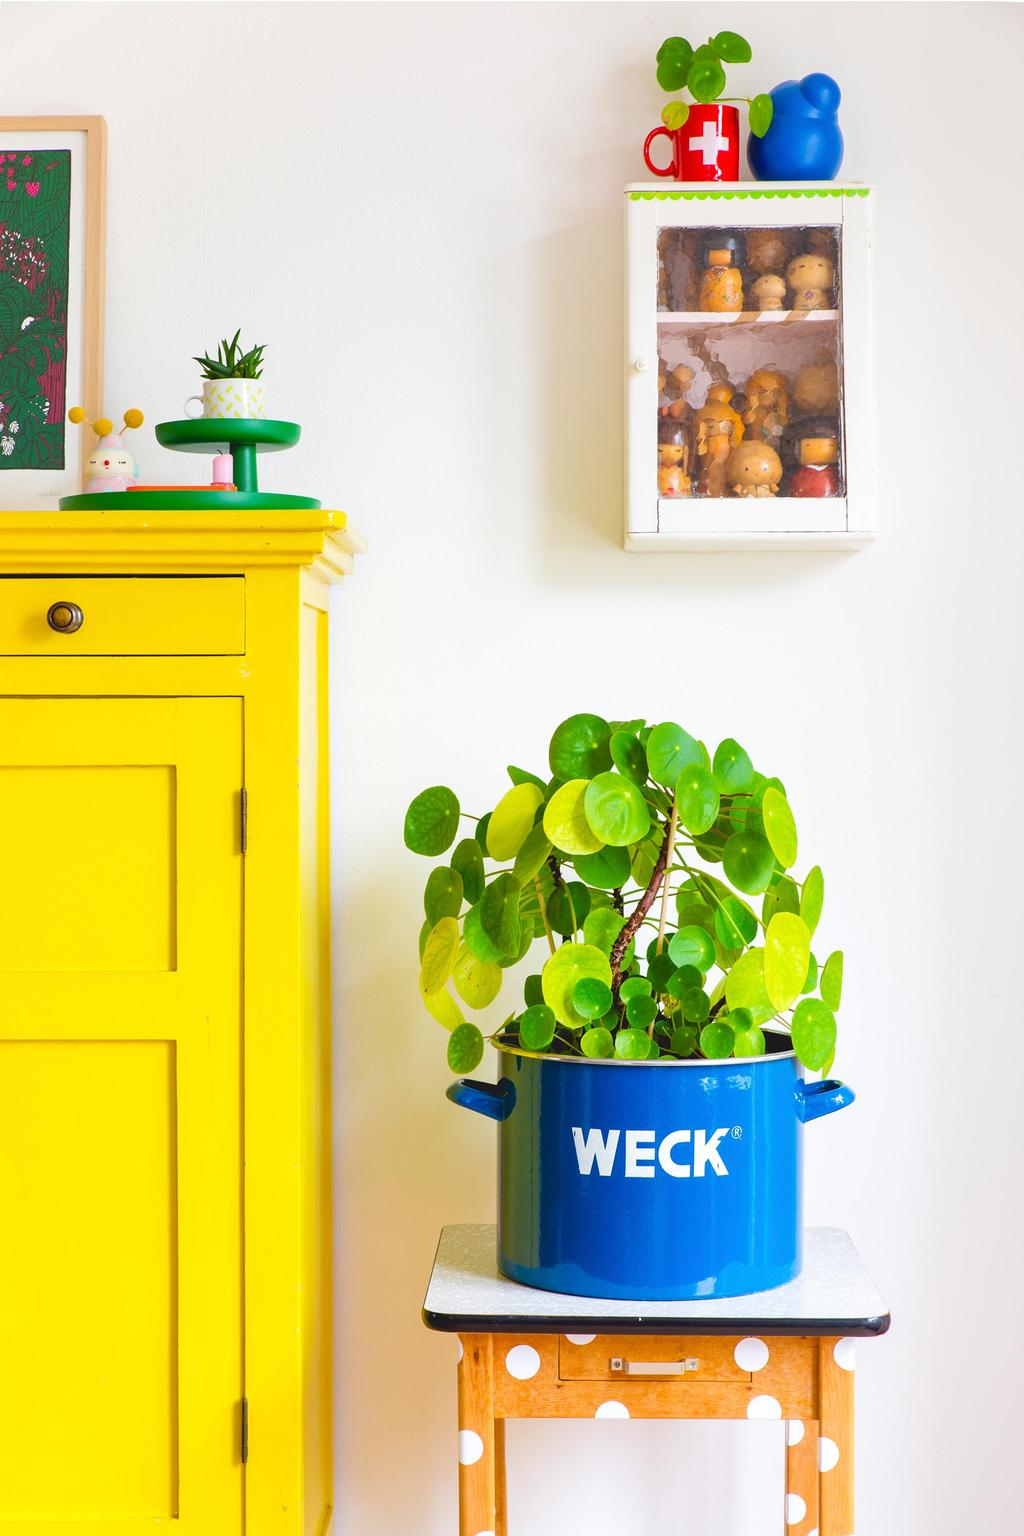 Stippentafel met plant naast een gele kast